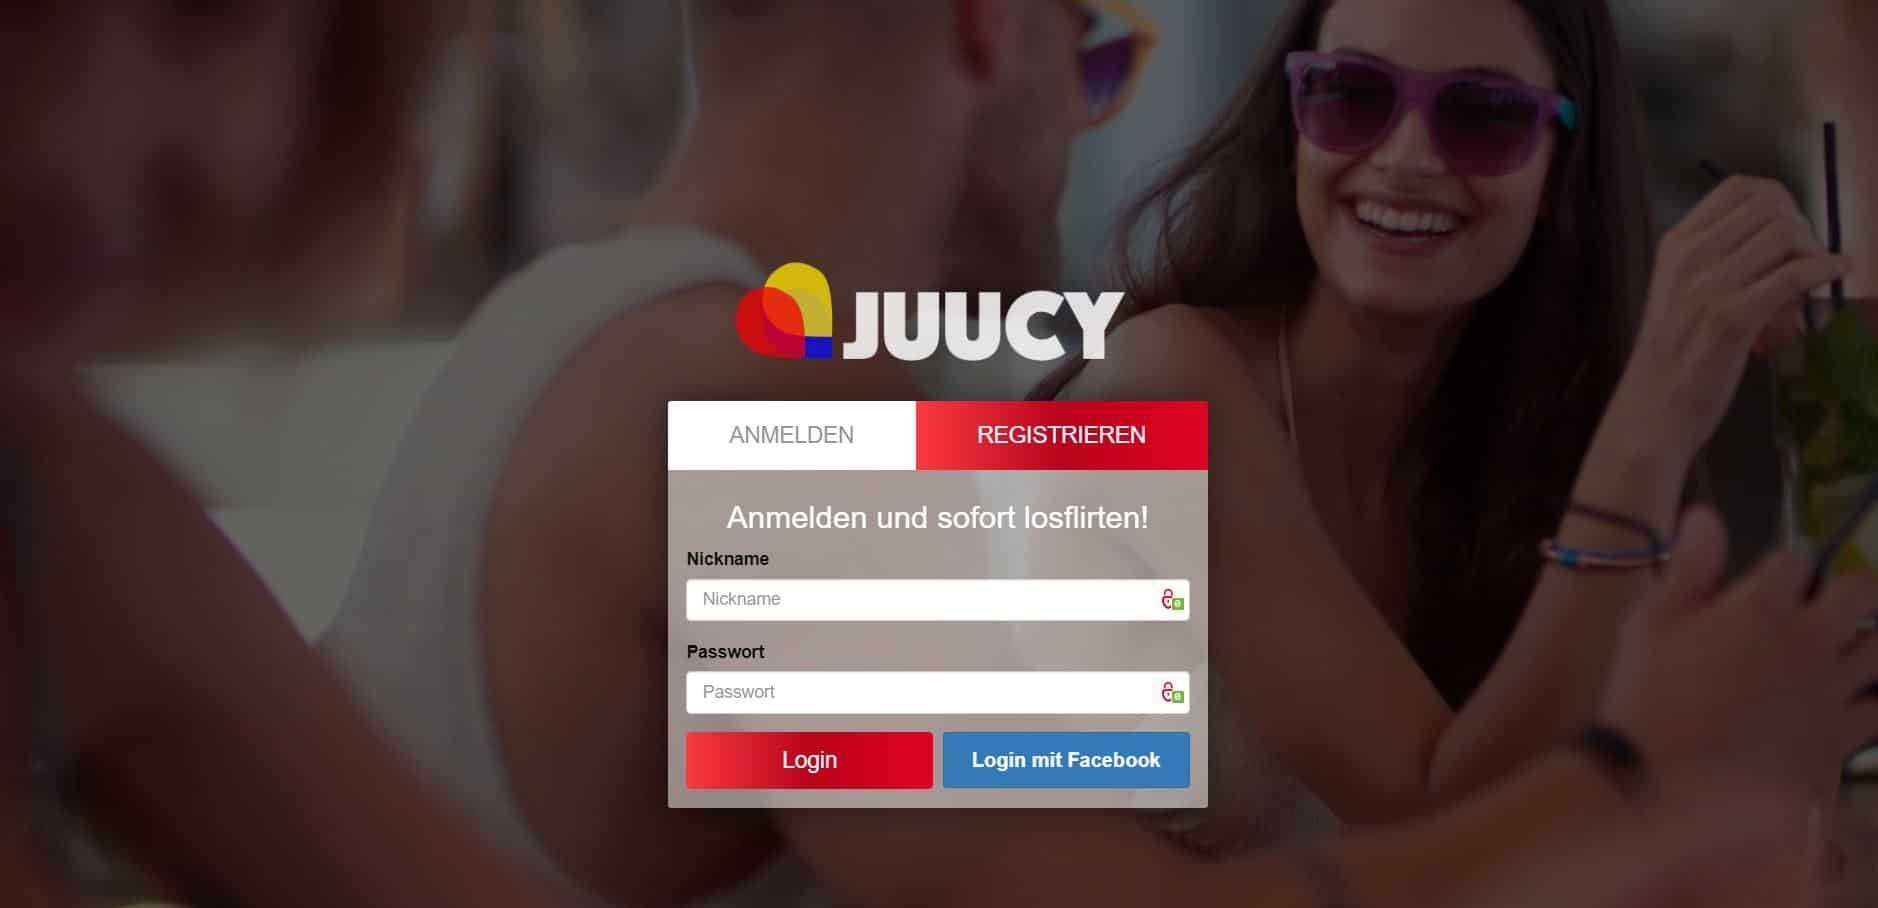 Testbericht: Juucy.de Abzocke